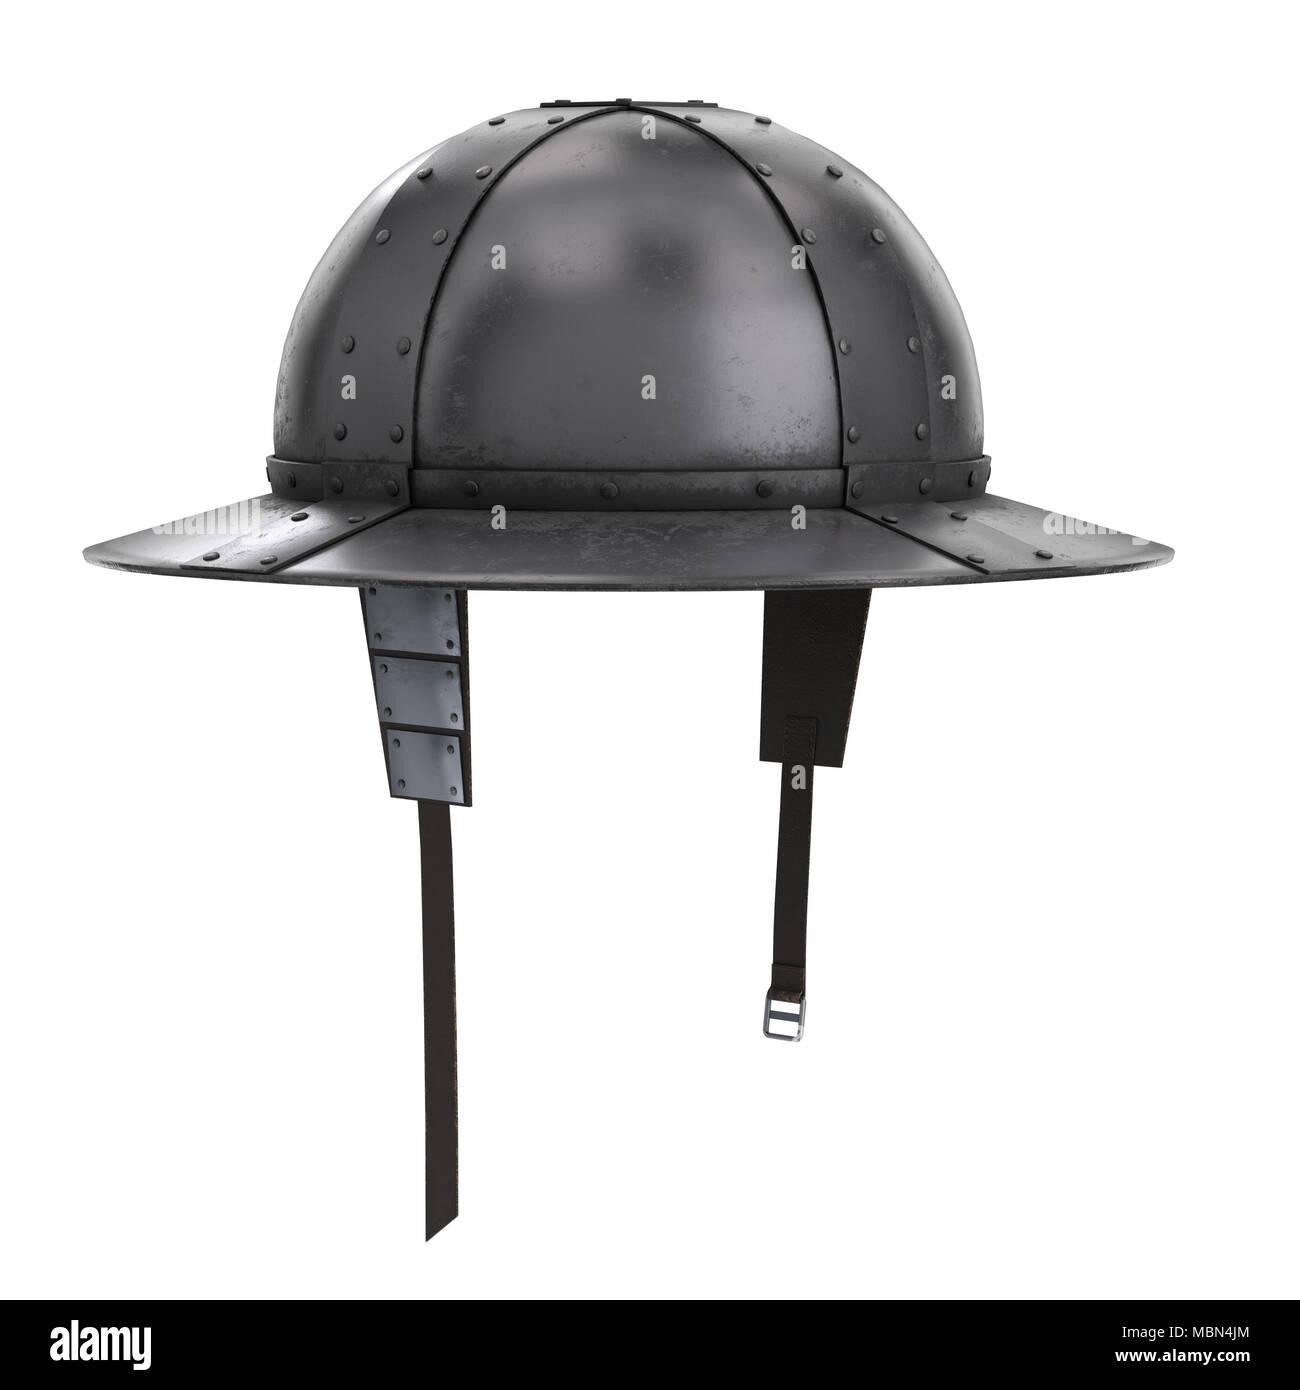 da28537fcf24b Kettle Hat Imágenes De Stock   Kettle Hat Fotos De Stock - Alamy